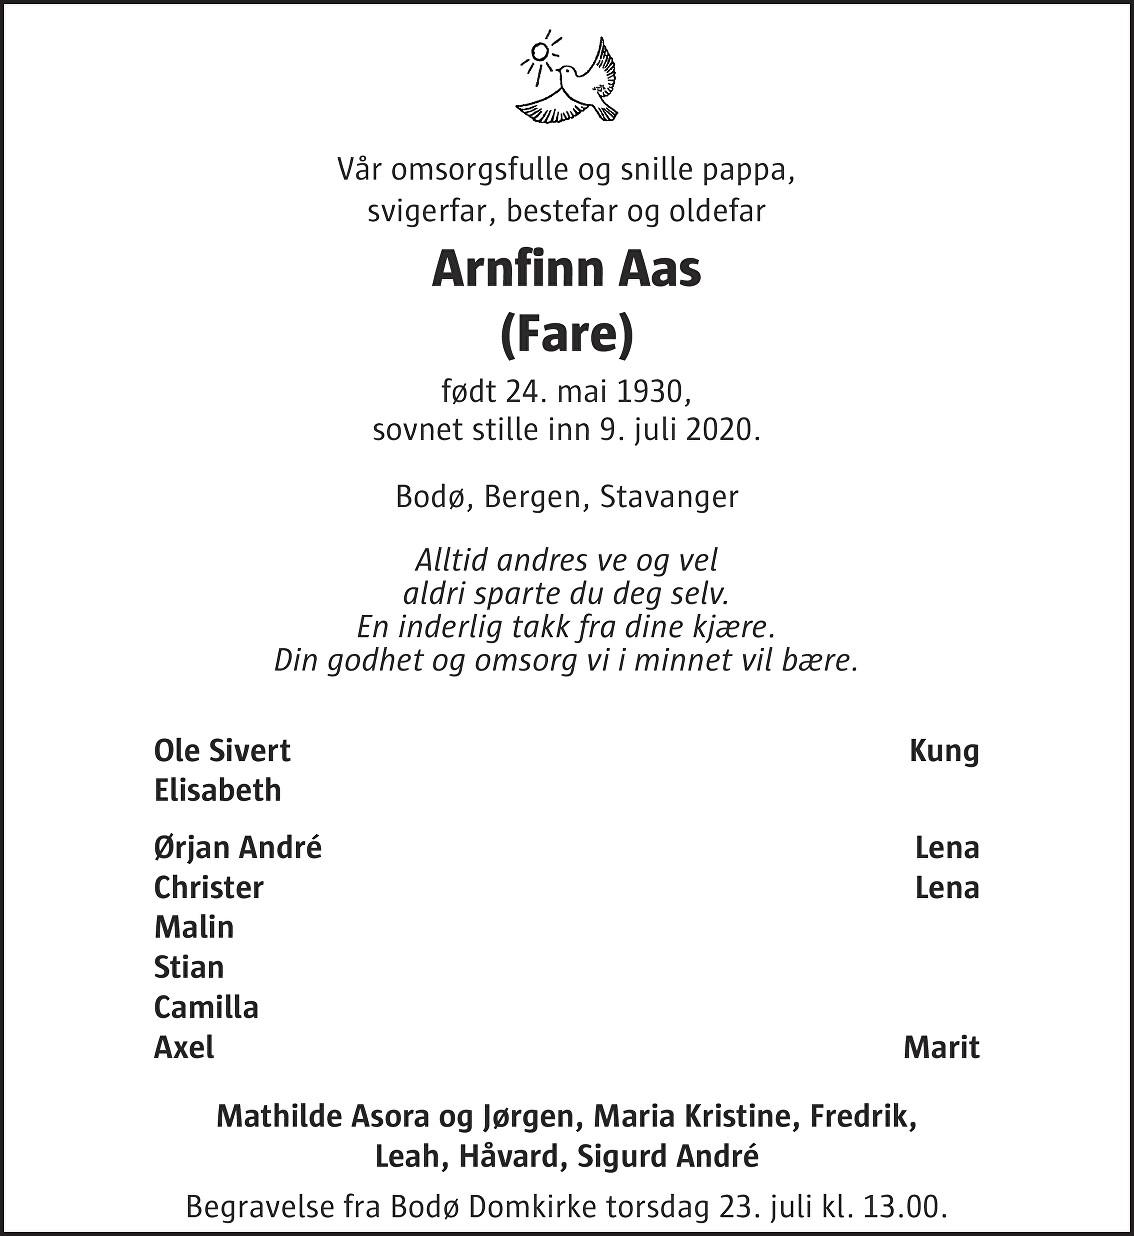 Arnfinn Aas Dødsannonse